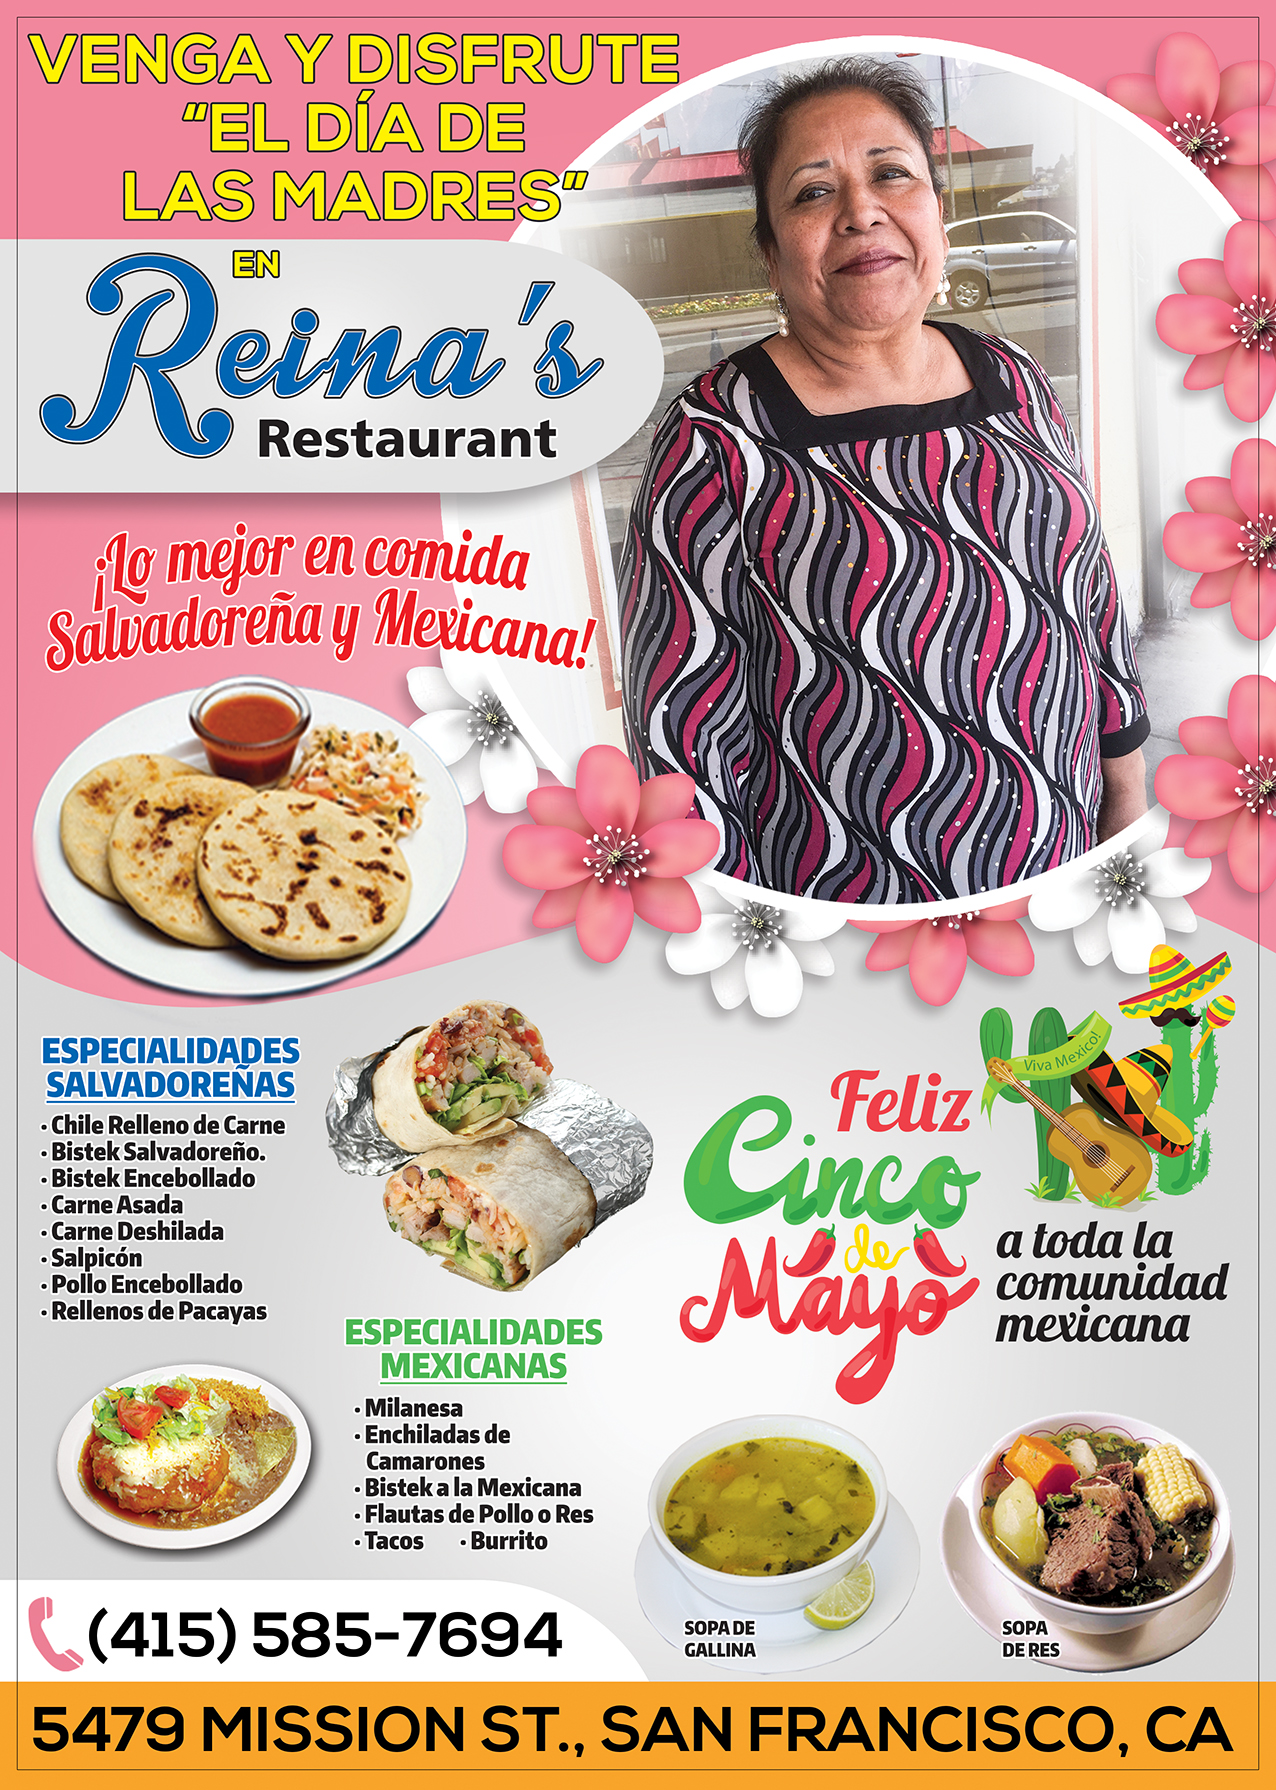 Reinas Restaurant 1 Pag glossy Mayo 2019 copy.jpg